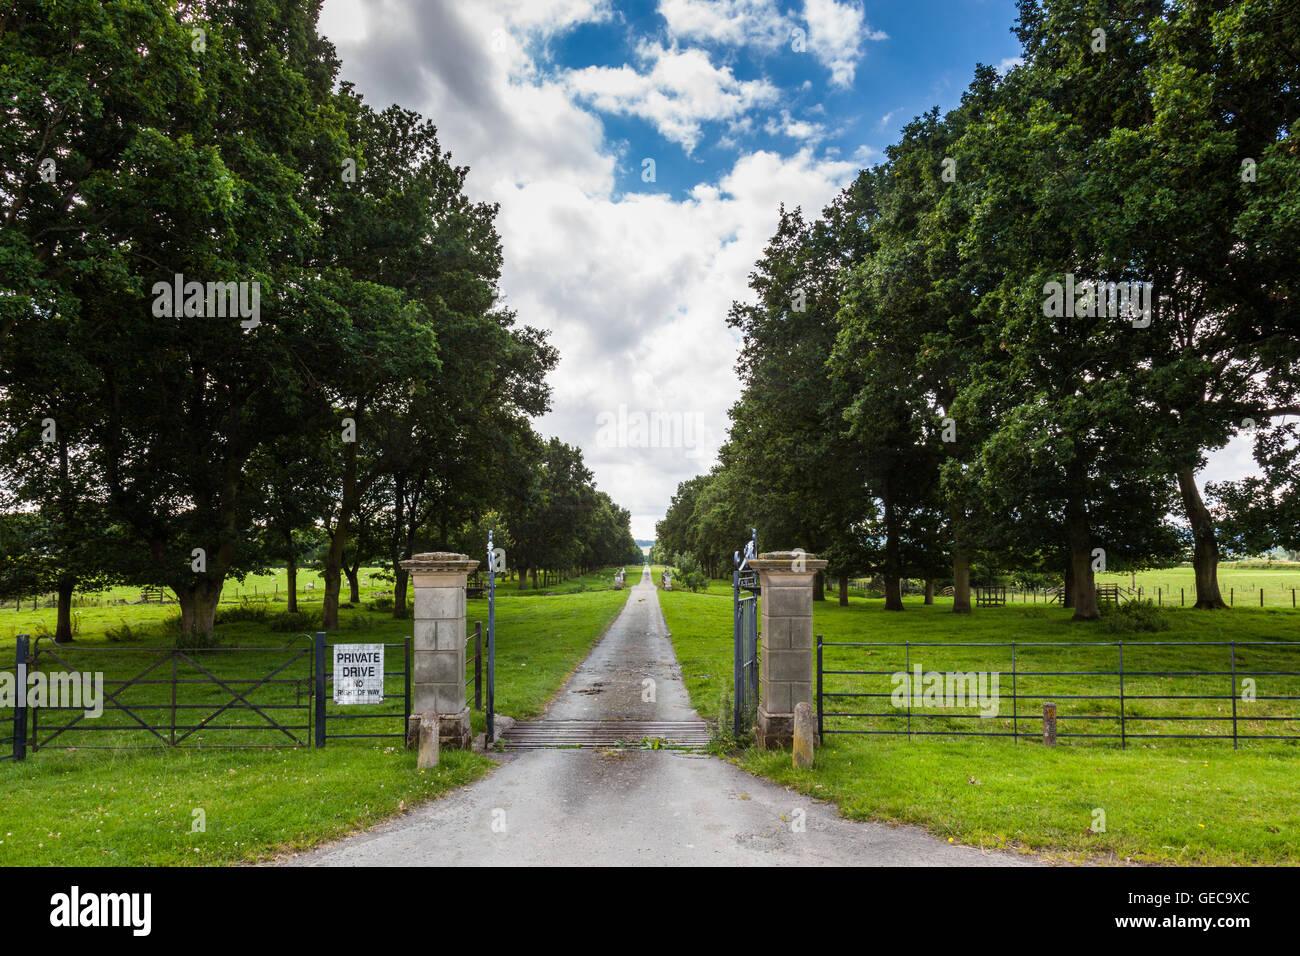 Oak Avenue, near Linley Hall, More, Lydham, Shropshire, UK - Stock Image